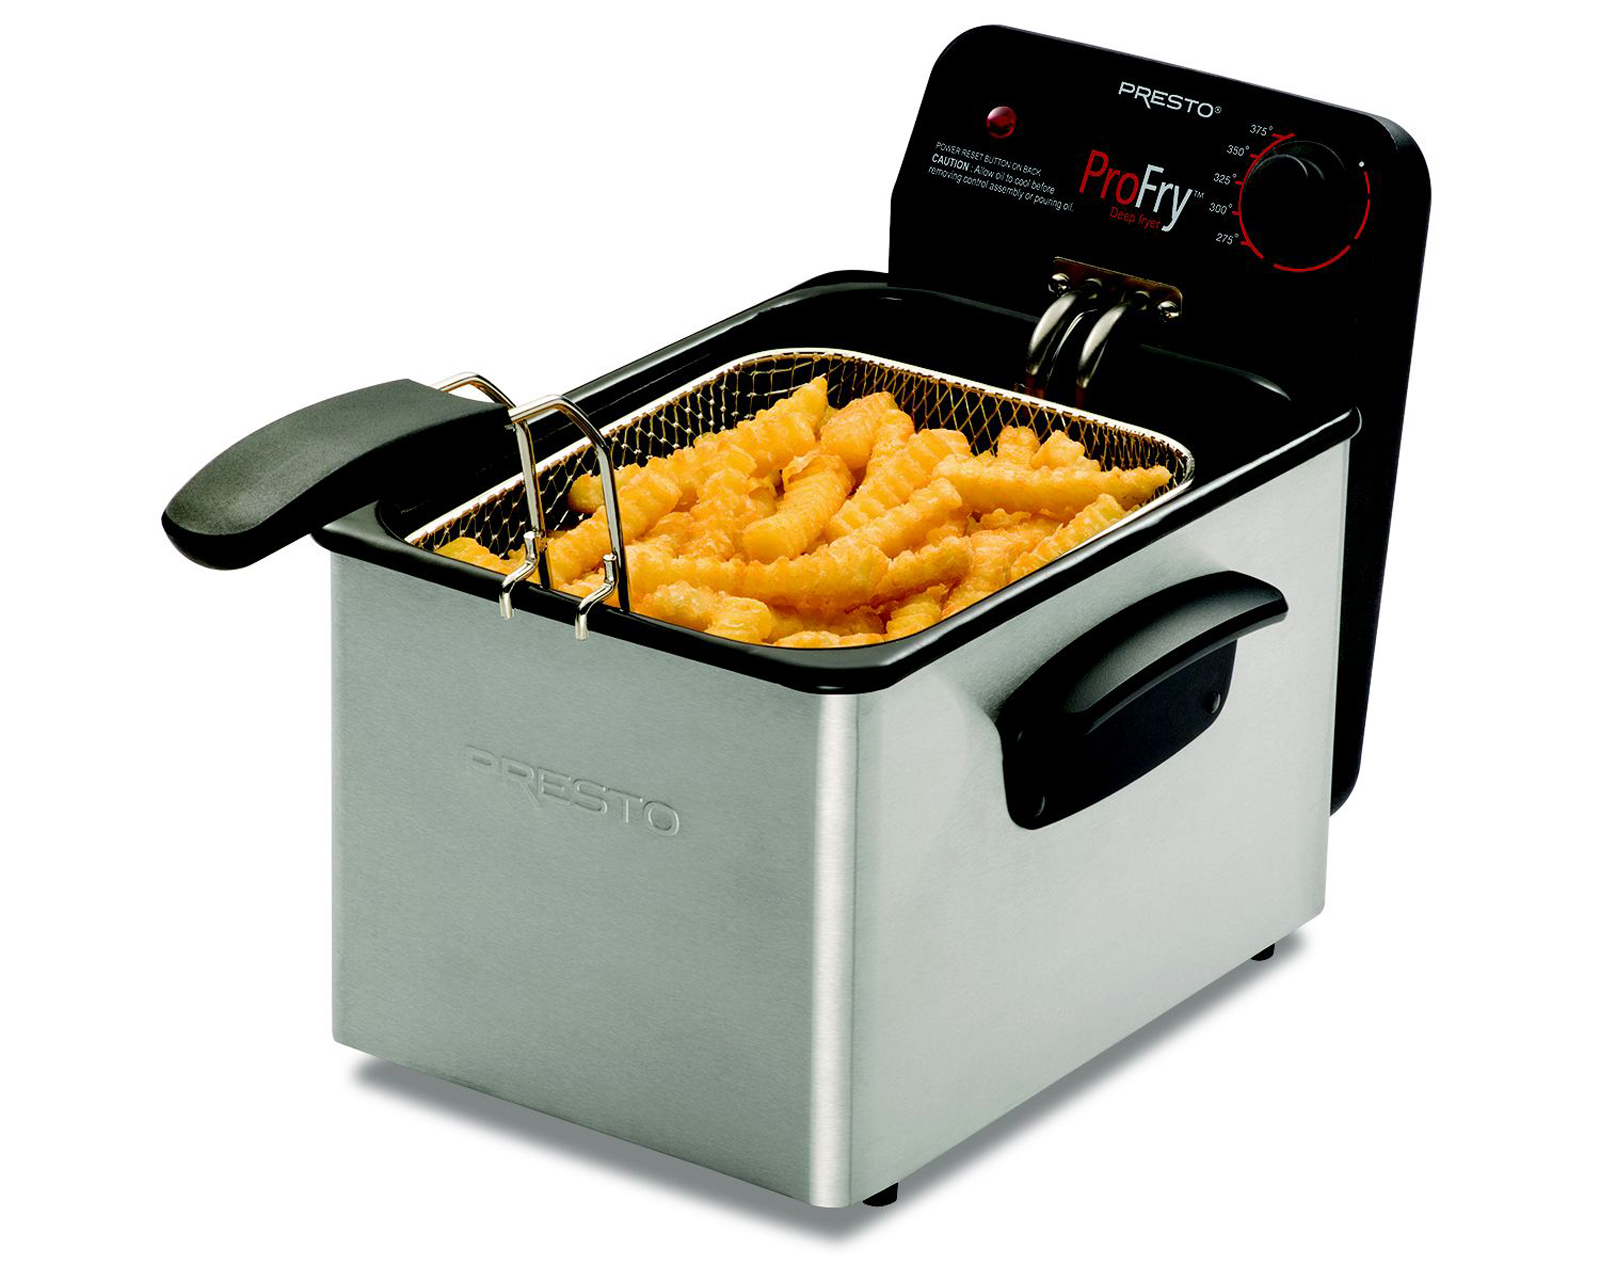 Presto ProFry Deep Fryer